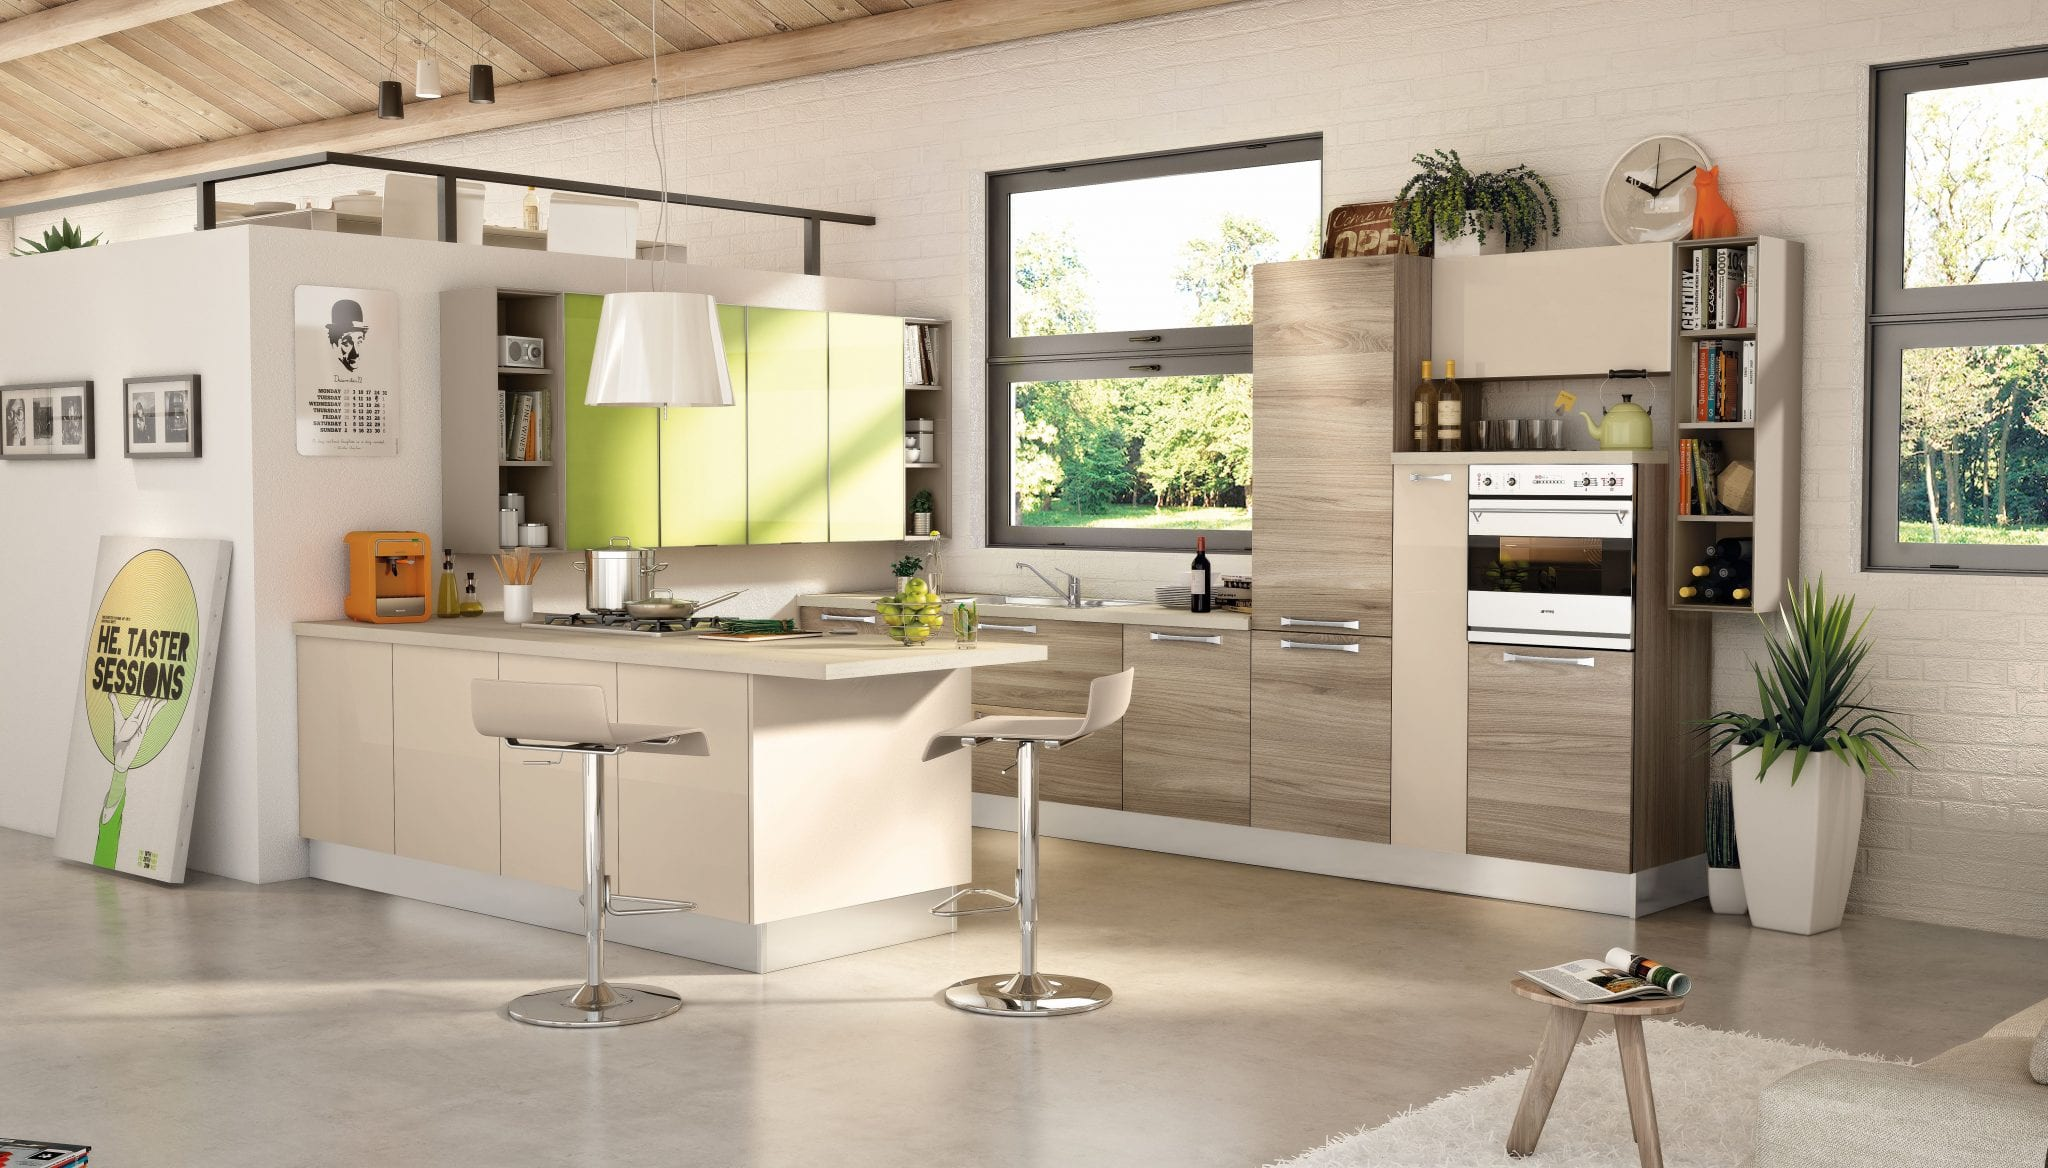 Cucine Lube Noemi : Cucina lube noemi